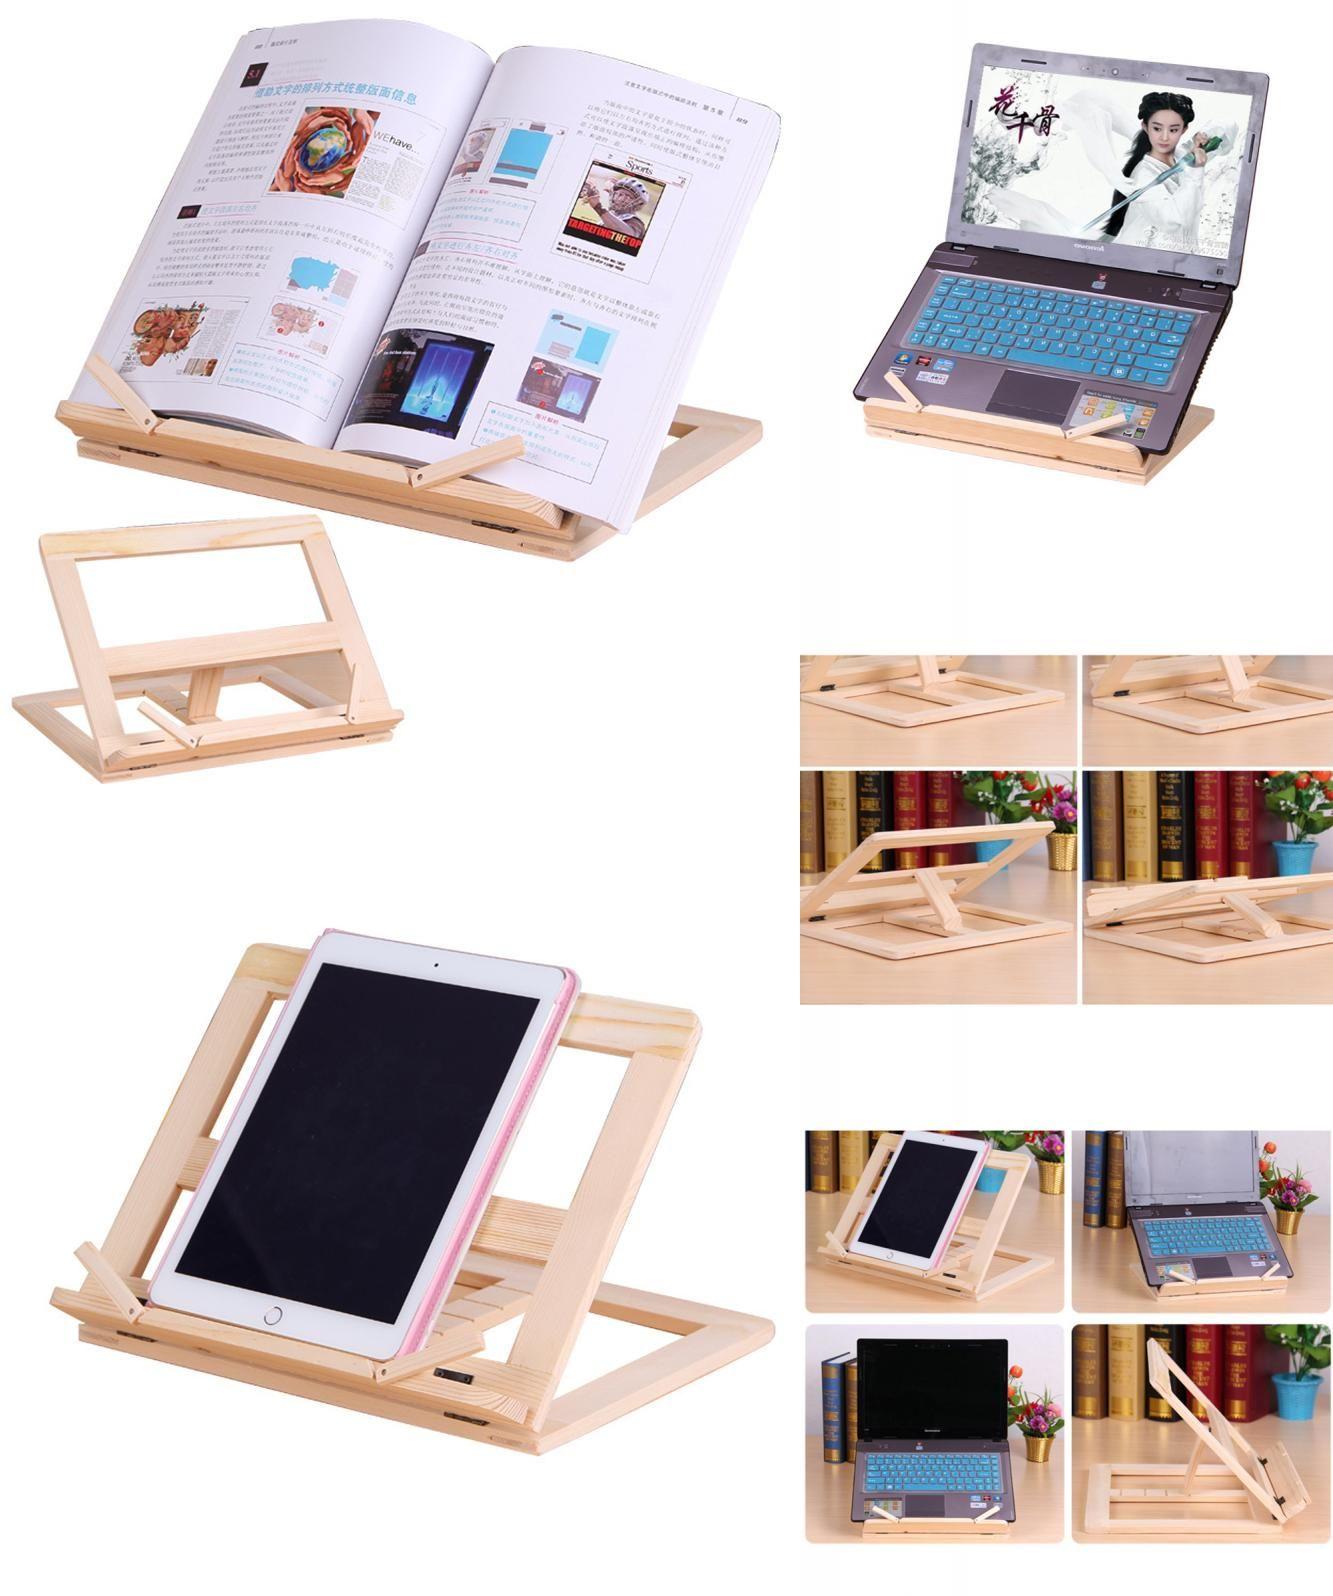 visit to adjustable wooden reading bookshelf foldable